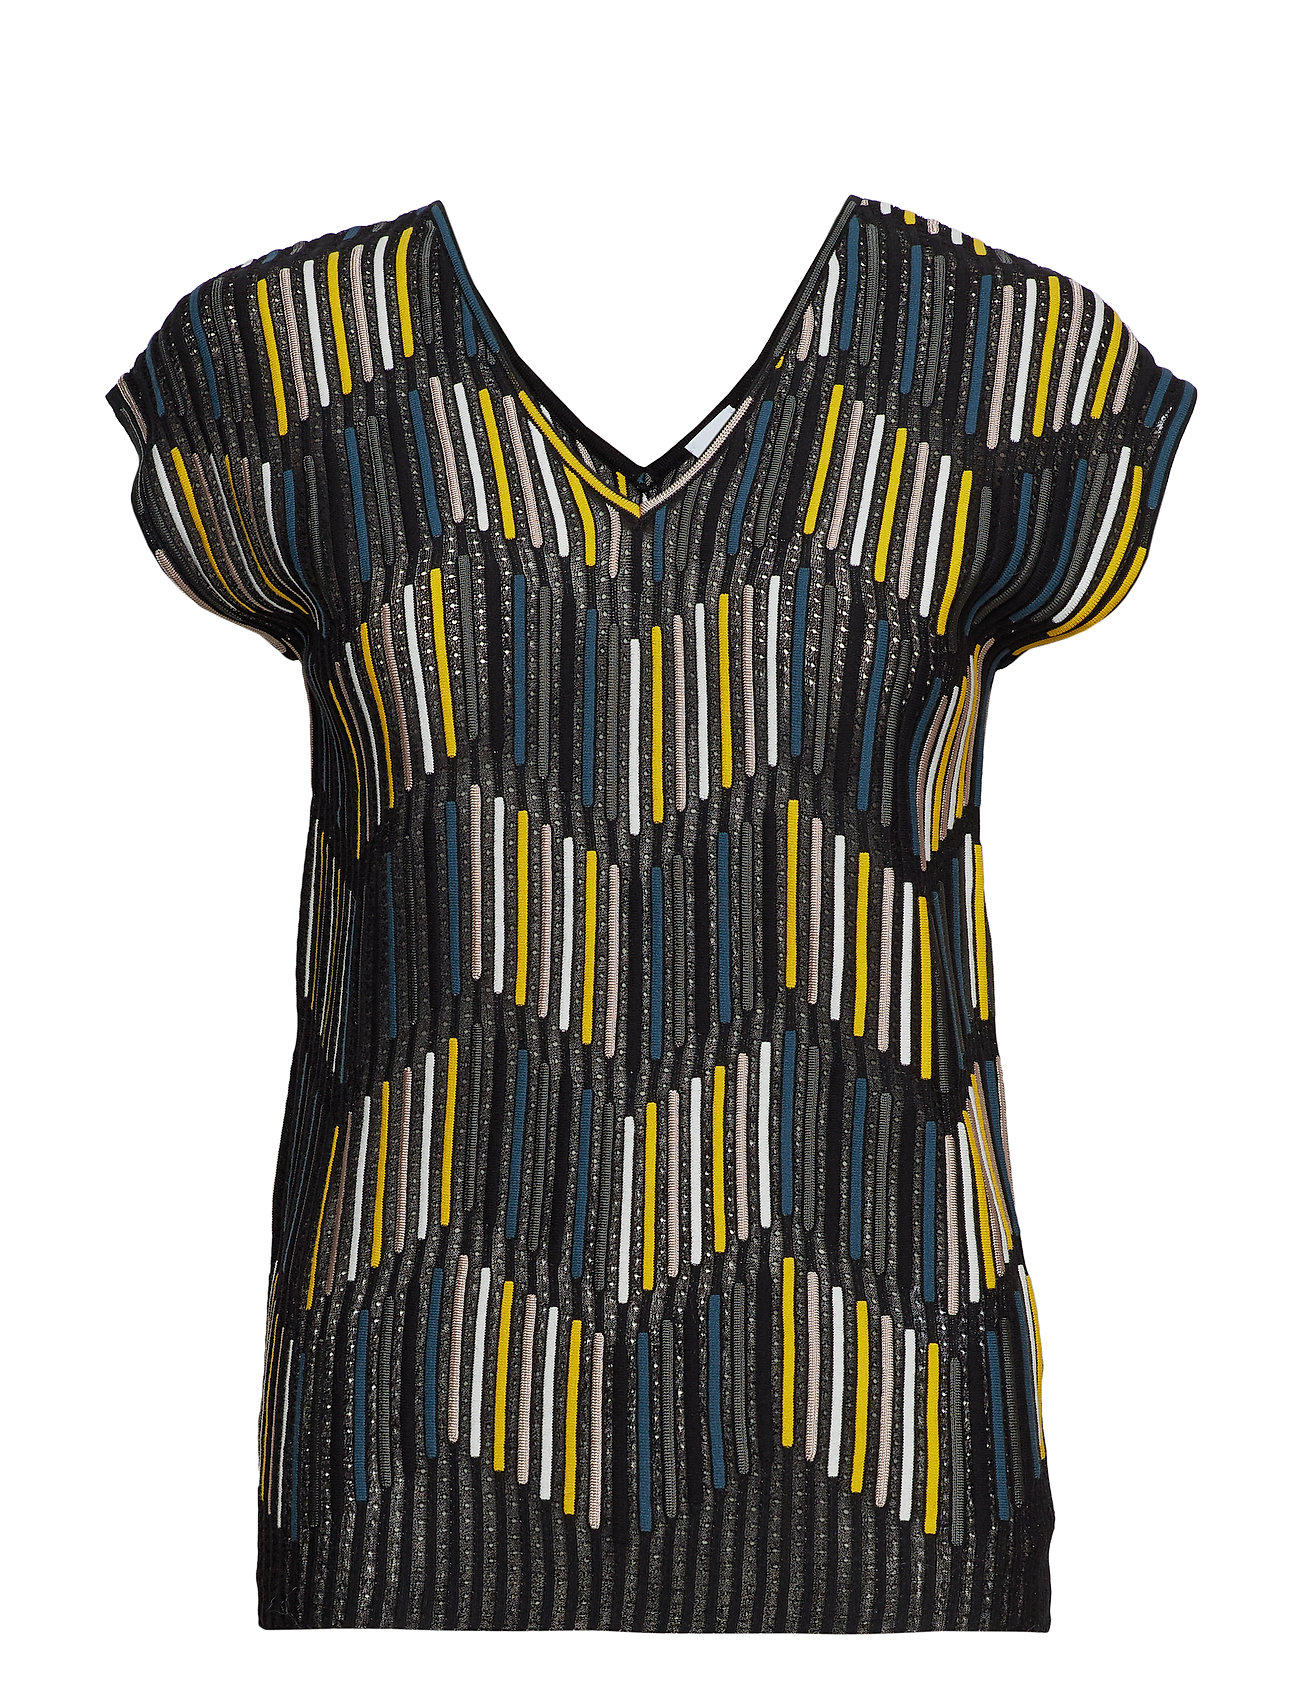 Image of 2dn00096-2k002b T-shirt Top Multi/mønstret M Missoni (3197190195)